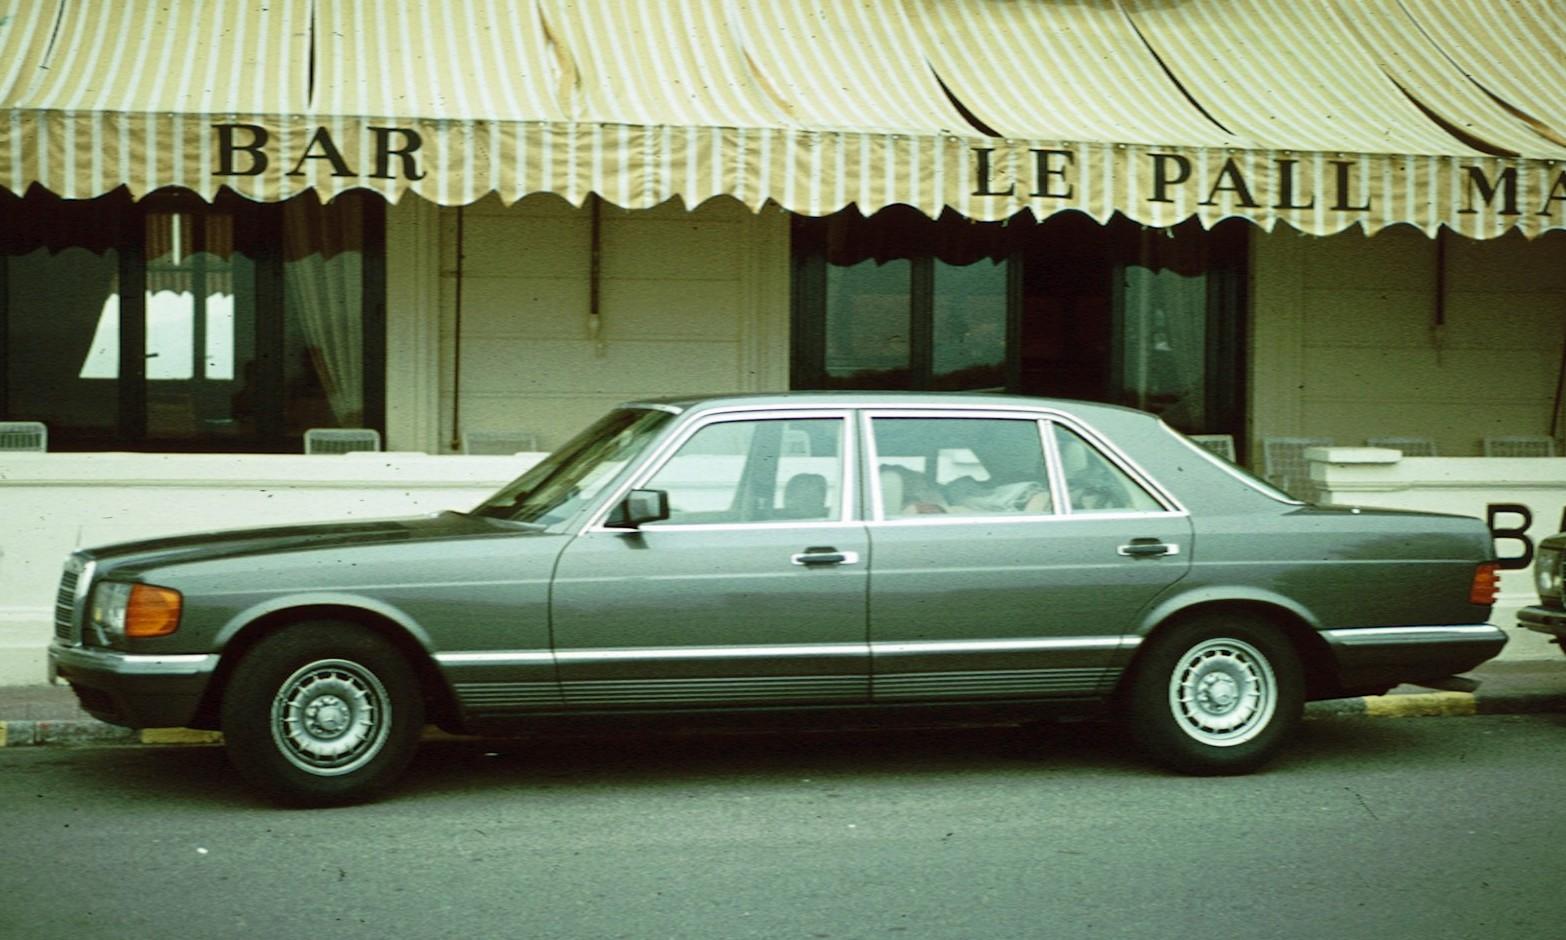 Mercedes-benz 300D 1981 Photo - 1